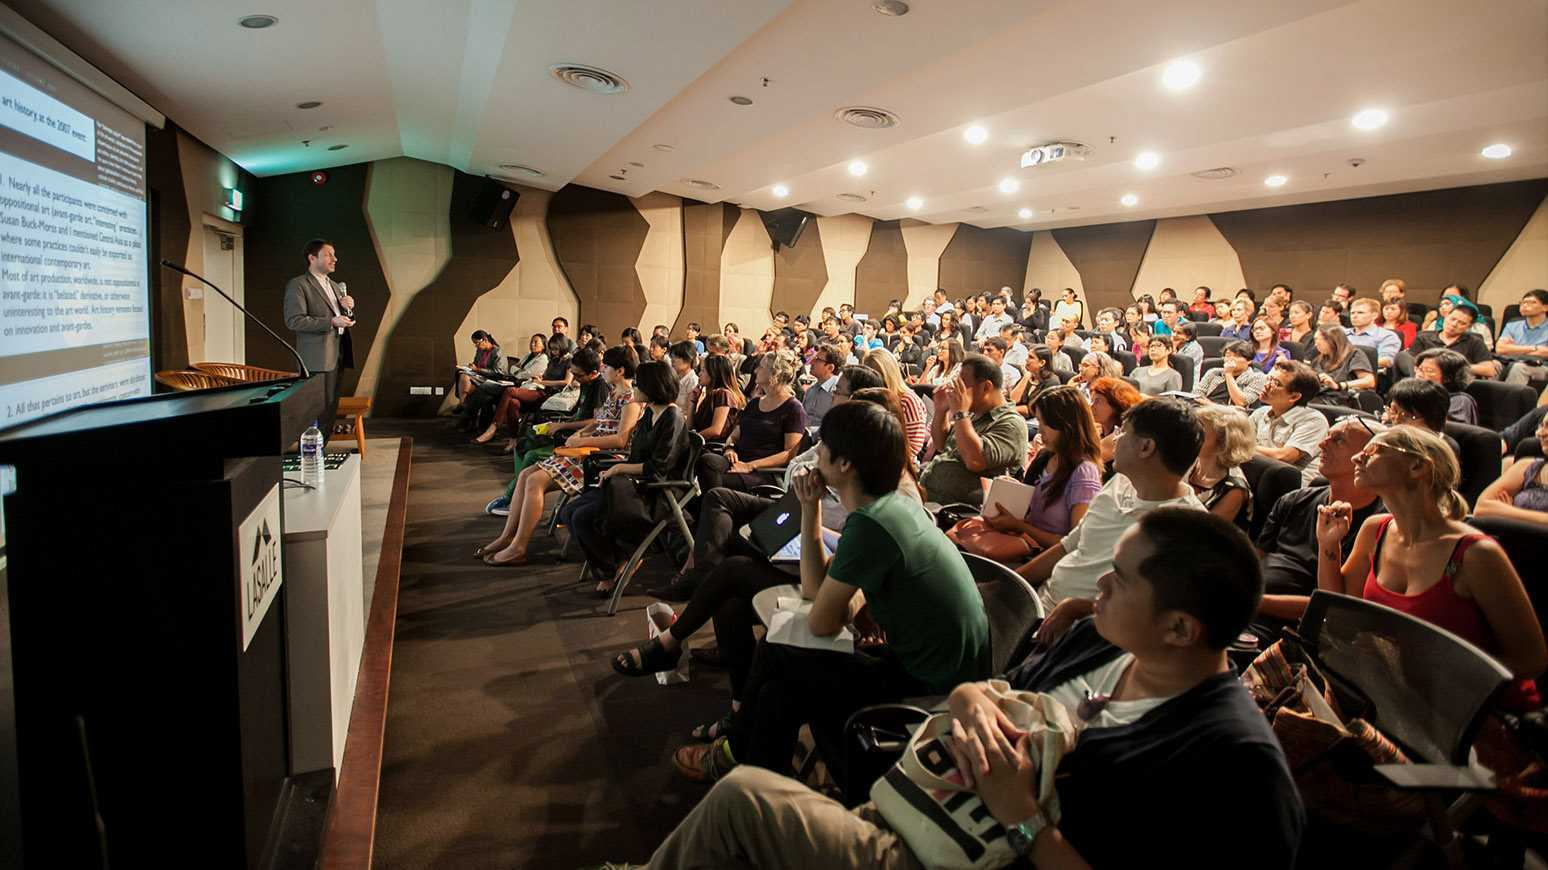 Rully Tanuwidjaja The New City Campus Lasalle-Sia Singapura Singapura Lasalle-Class-Theatre Kontemporer  48065